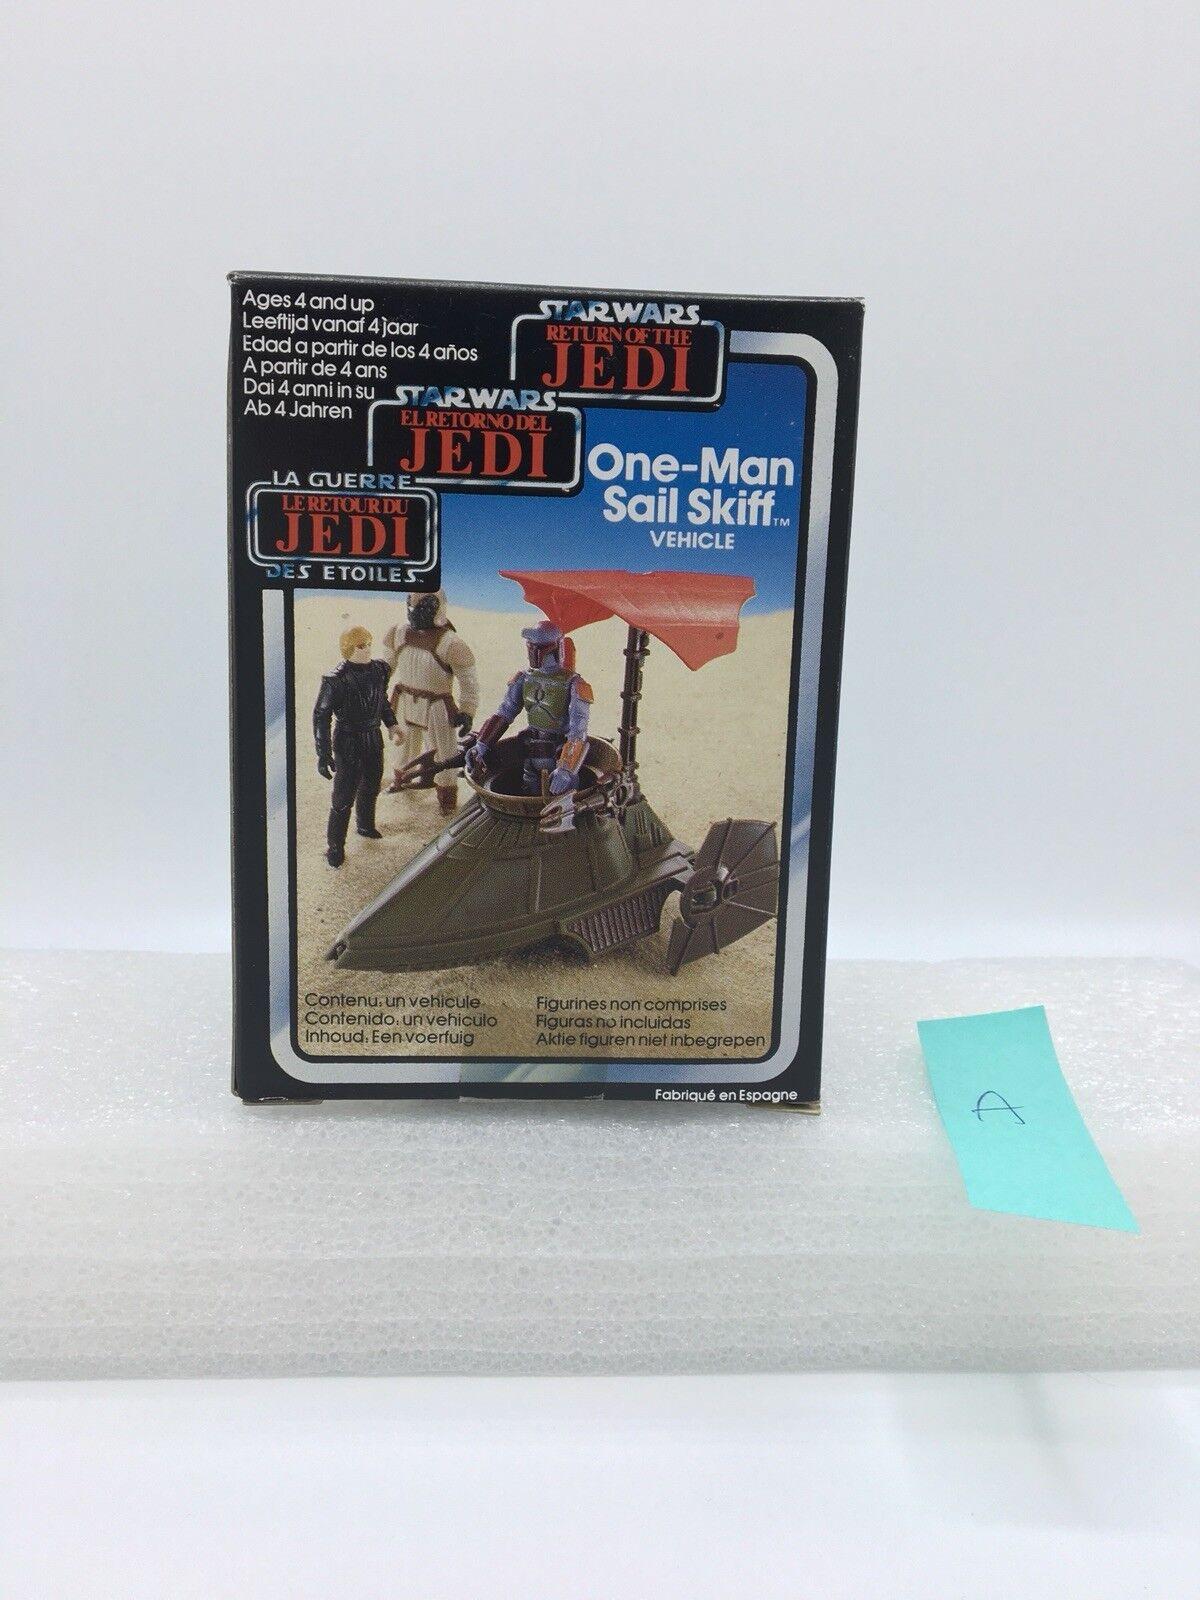 Star Wars ROTJ 1983 Palitoy Trilogo One Man Sail Skiff Mini-Rig MISB Case Fresh